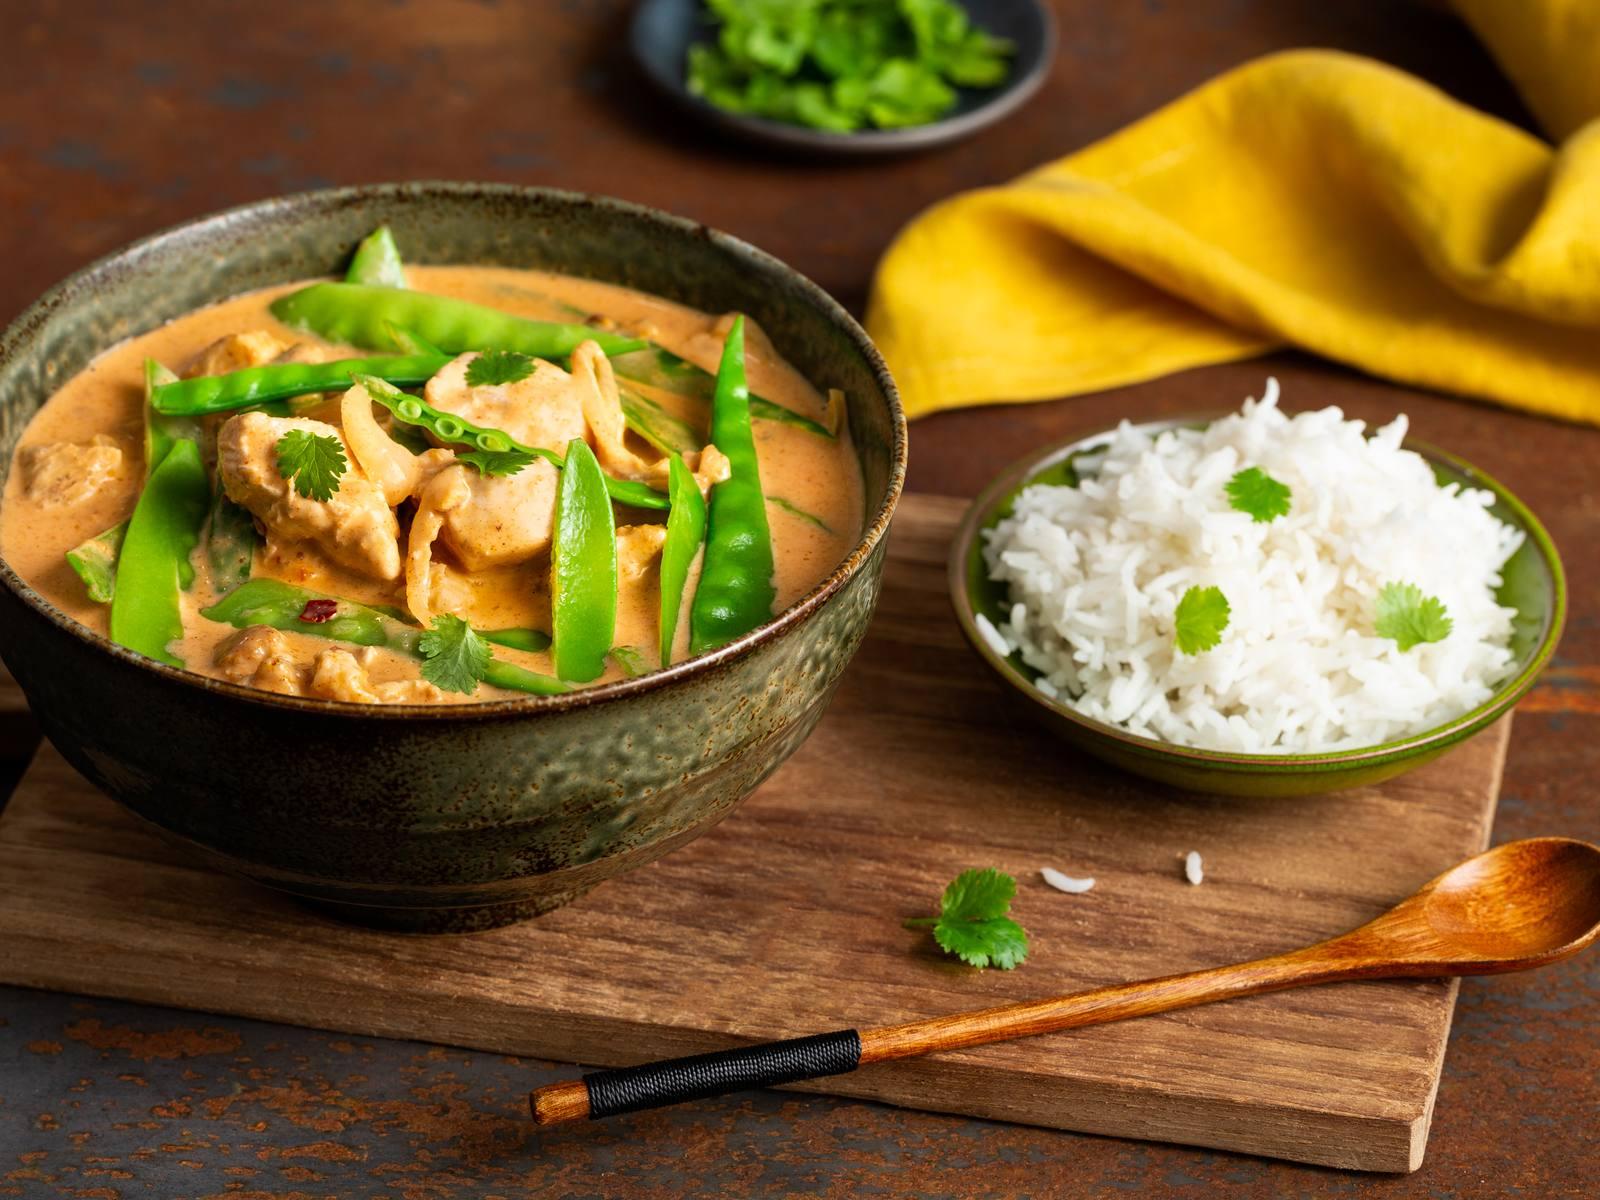 Thaise Rode Curry met kip en peultjes